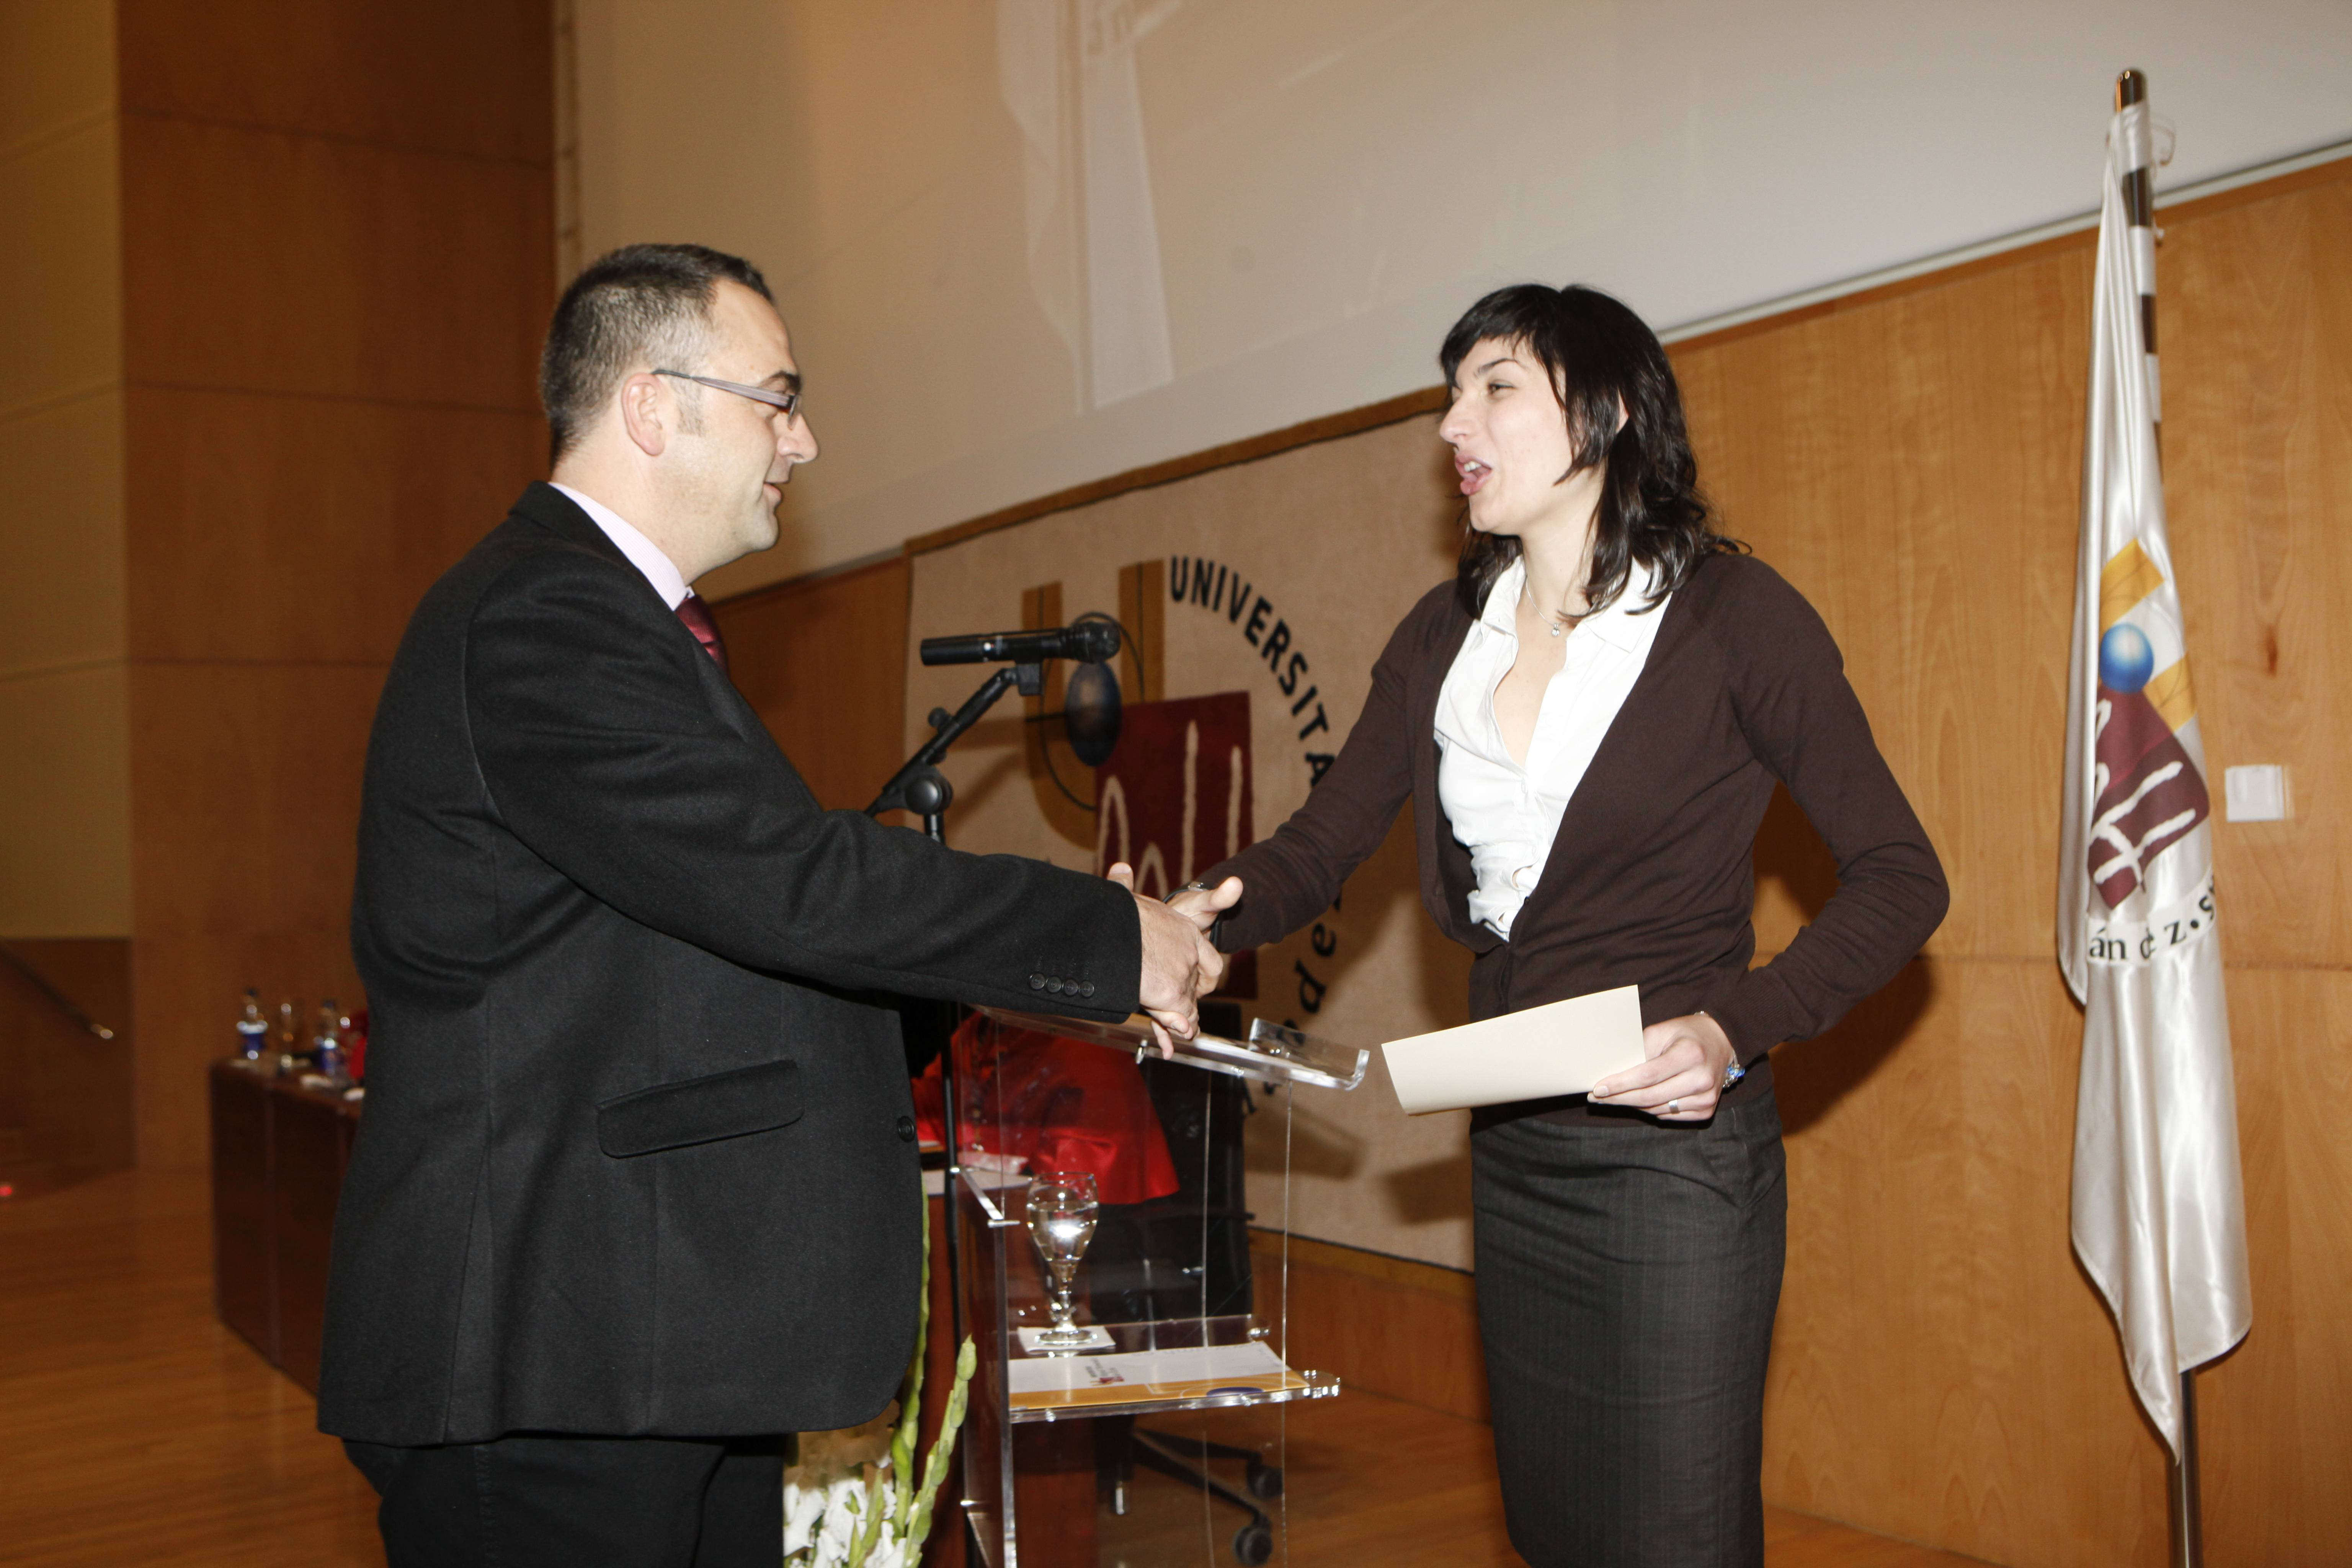 doctor-honoris-causa-luis-gamir_mg_0994.jpg